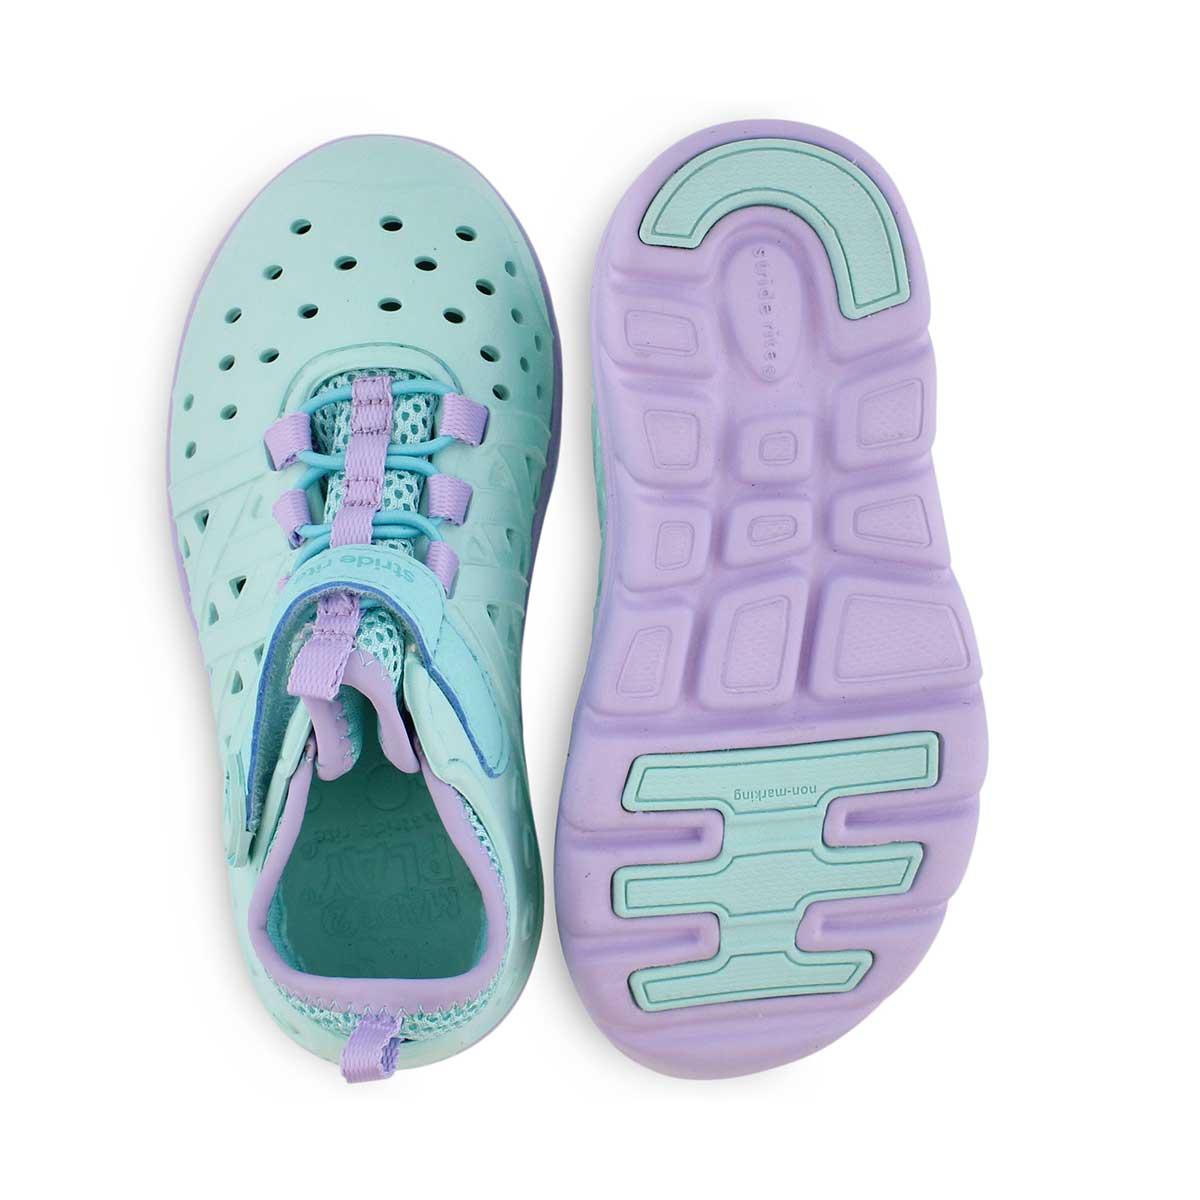 Grls M2P Phibian turquoise sneaker